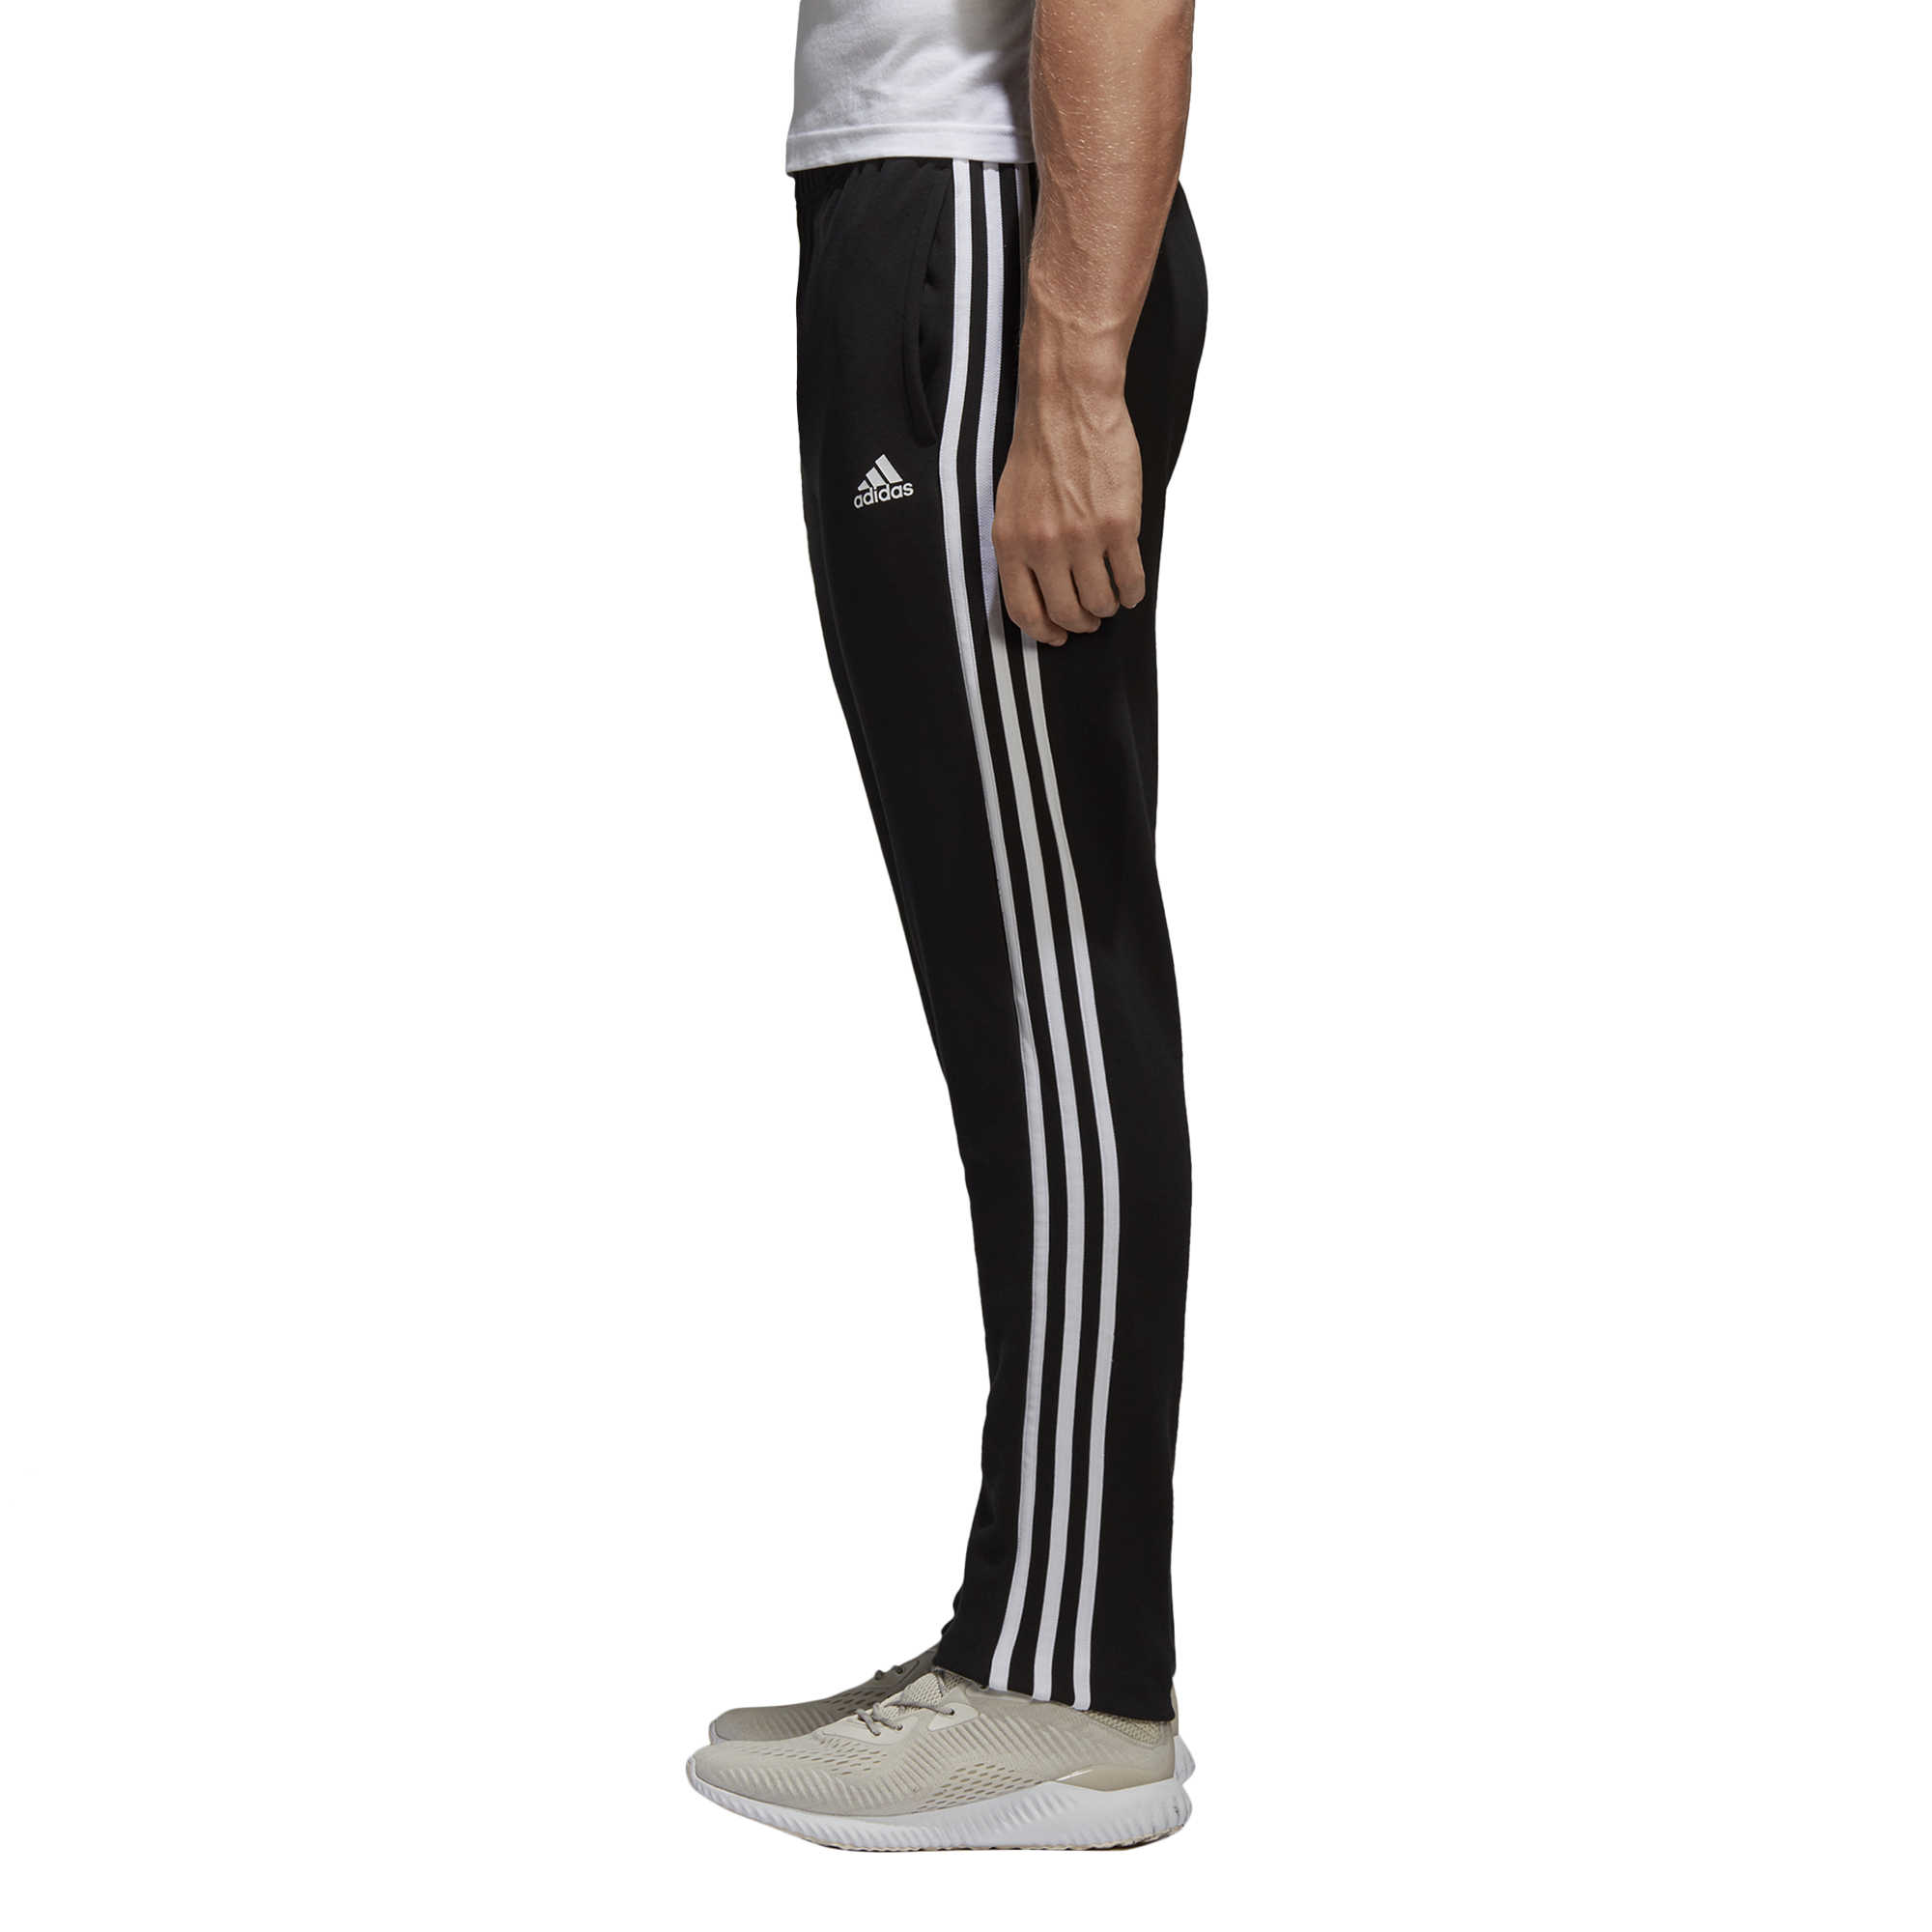 db2cf6dc7f9f9 adidas spodnie dresy Essentials 3 stripes BK7446 M - 7287436196 ...